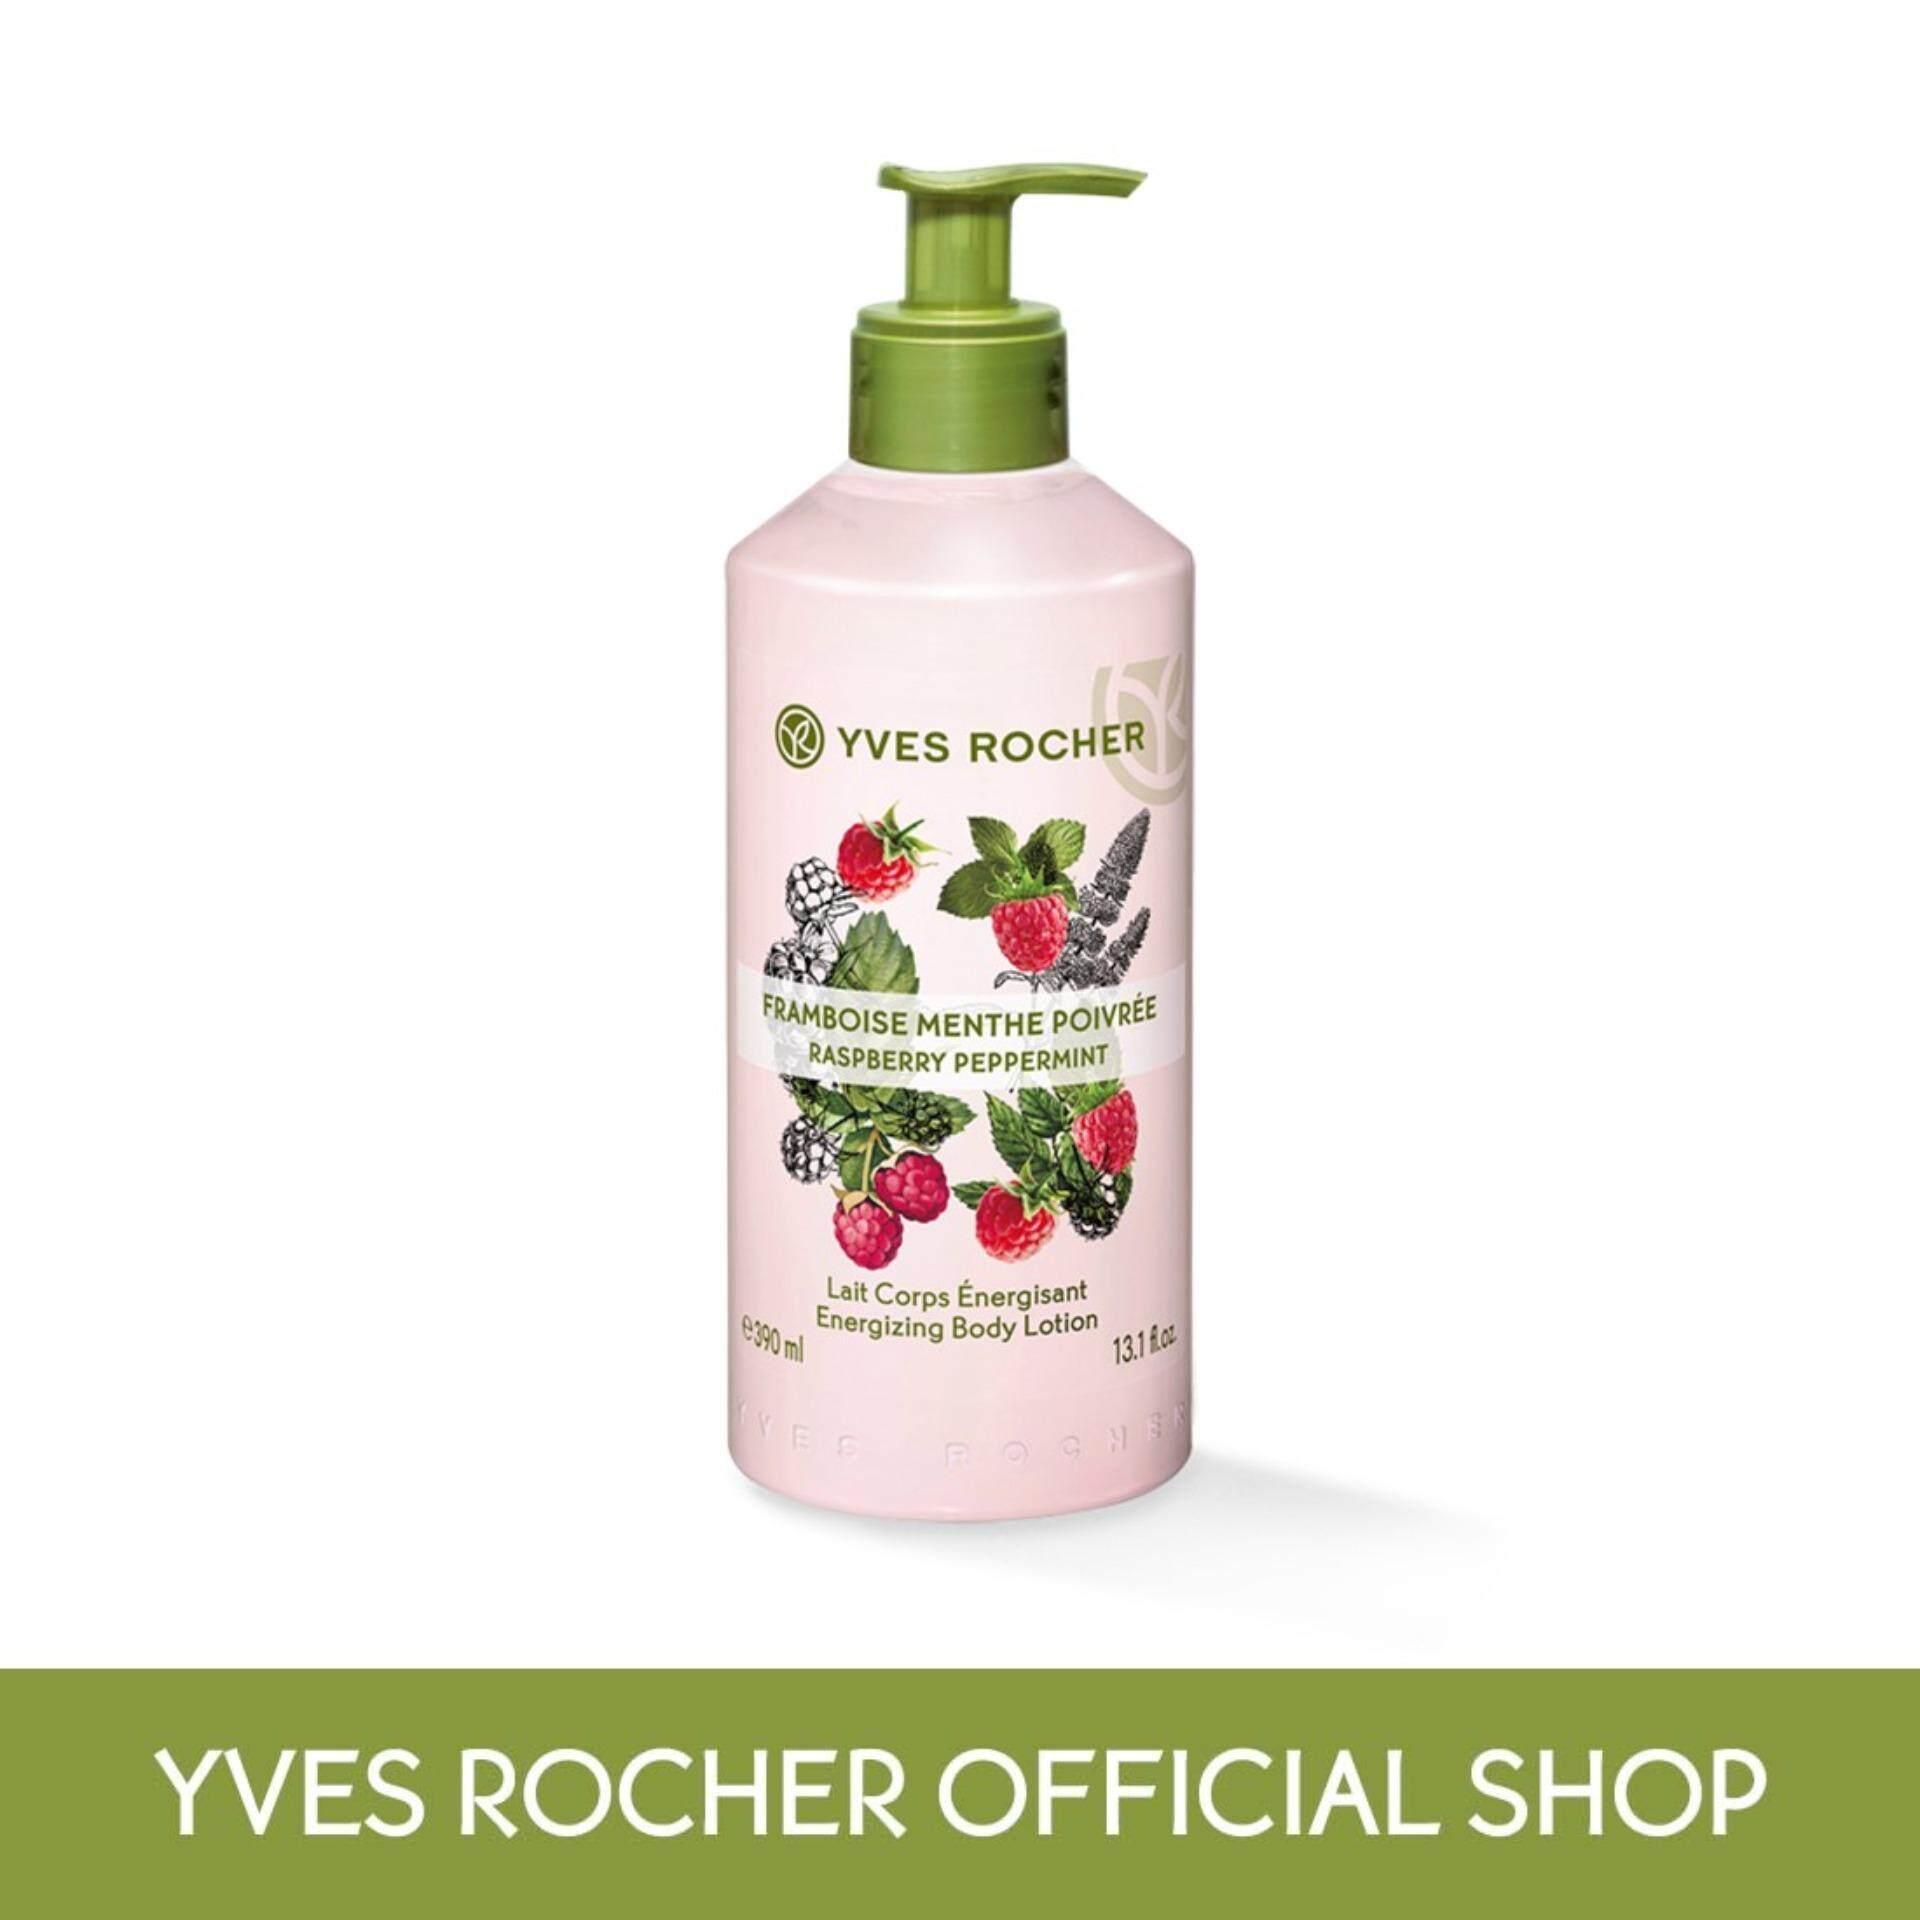 Yves Rocher Raspberry Peppermint Body Lotion 390ml